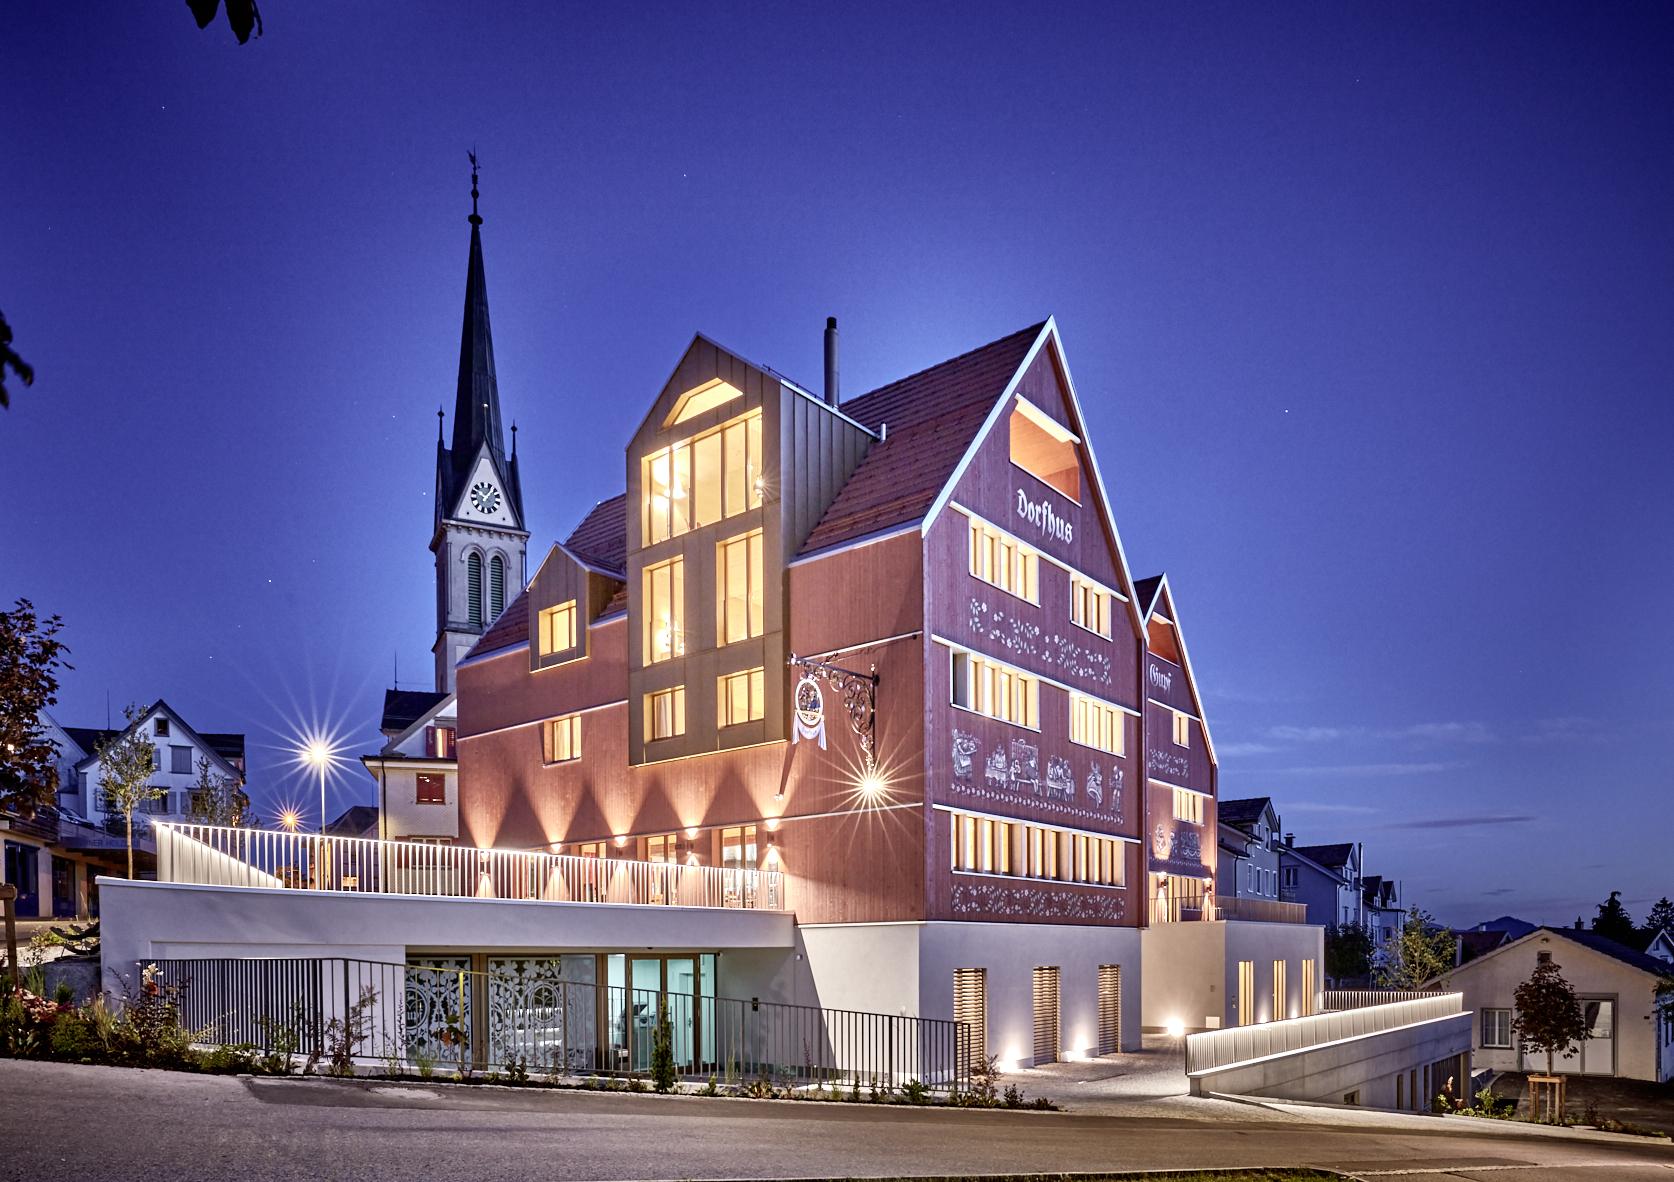 Restaurant & Hotel Dorfhus Gupf